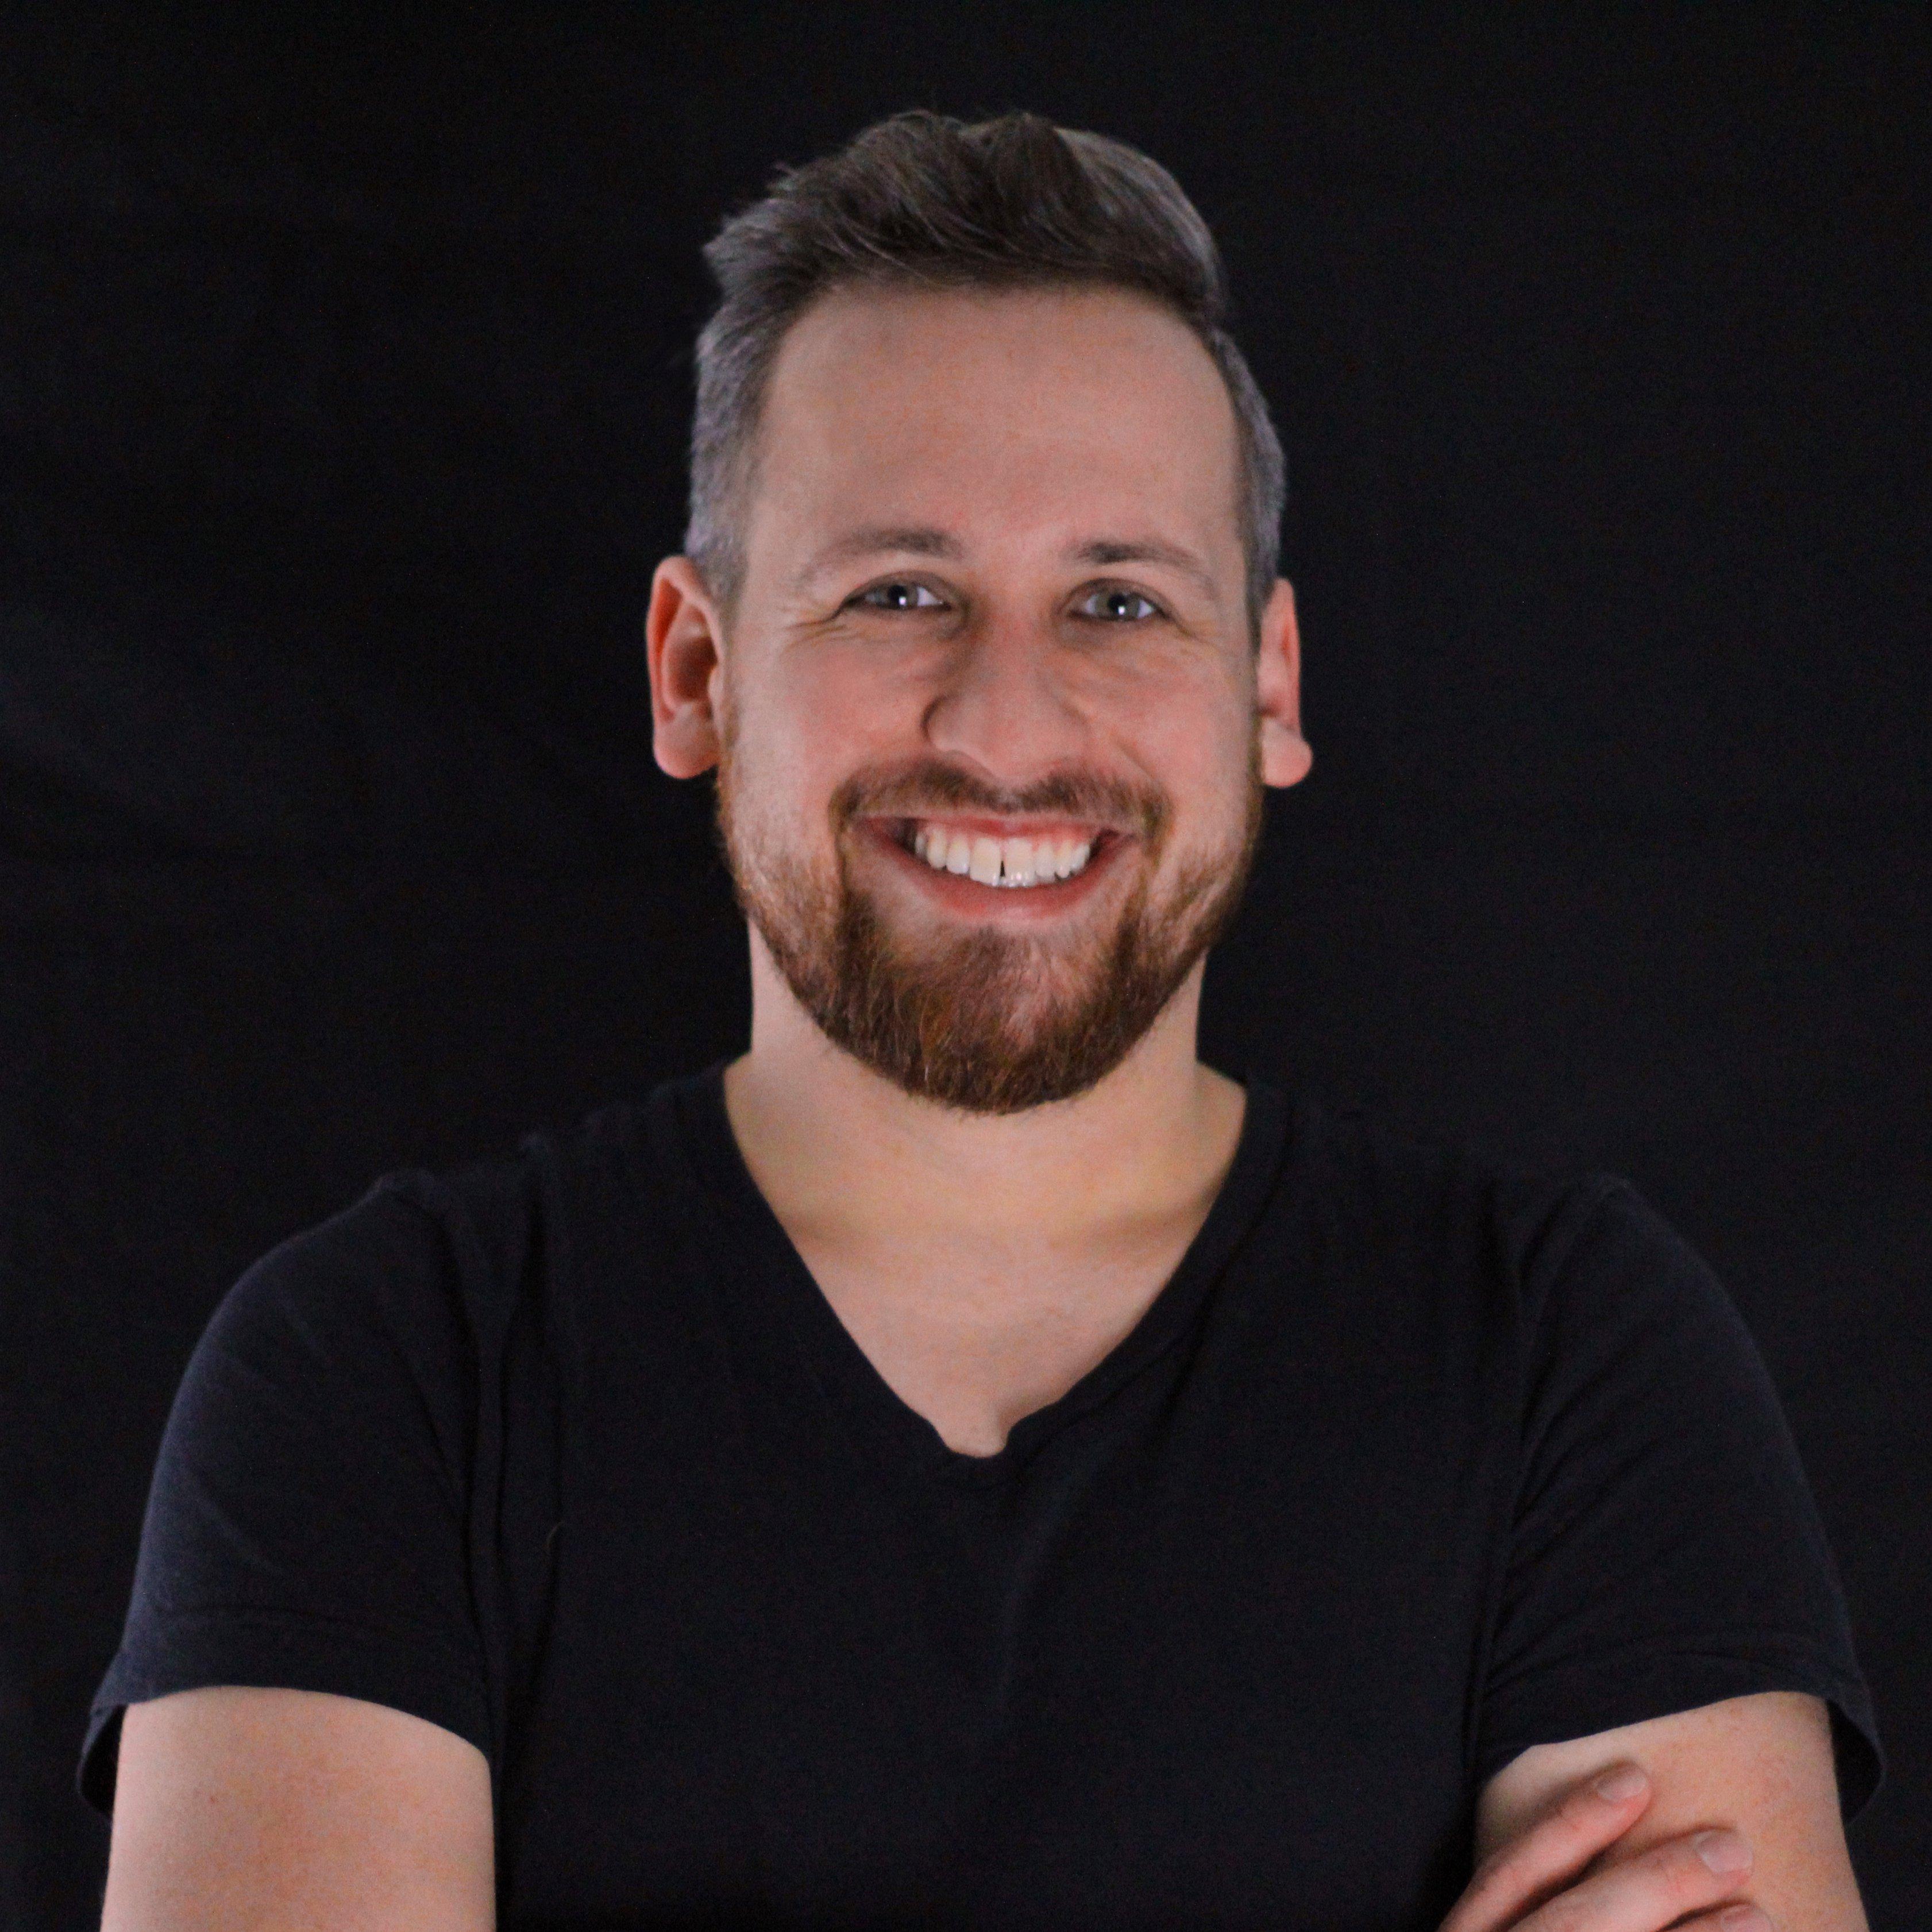 Tobias Heycke